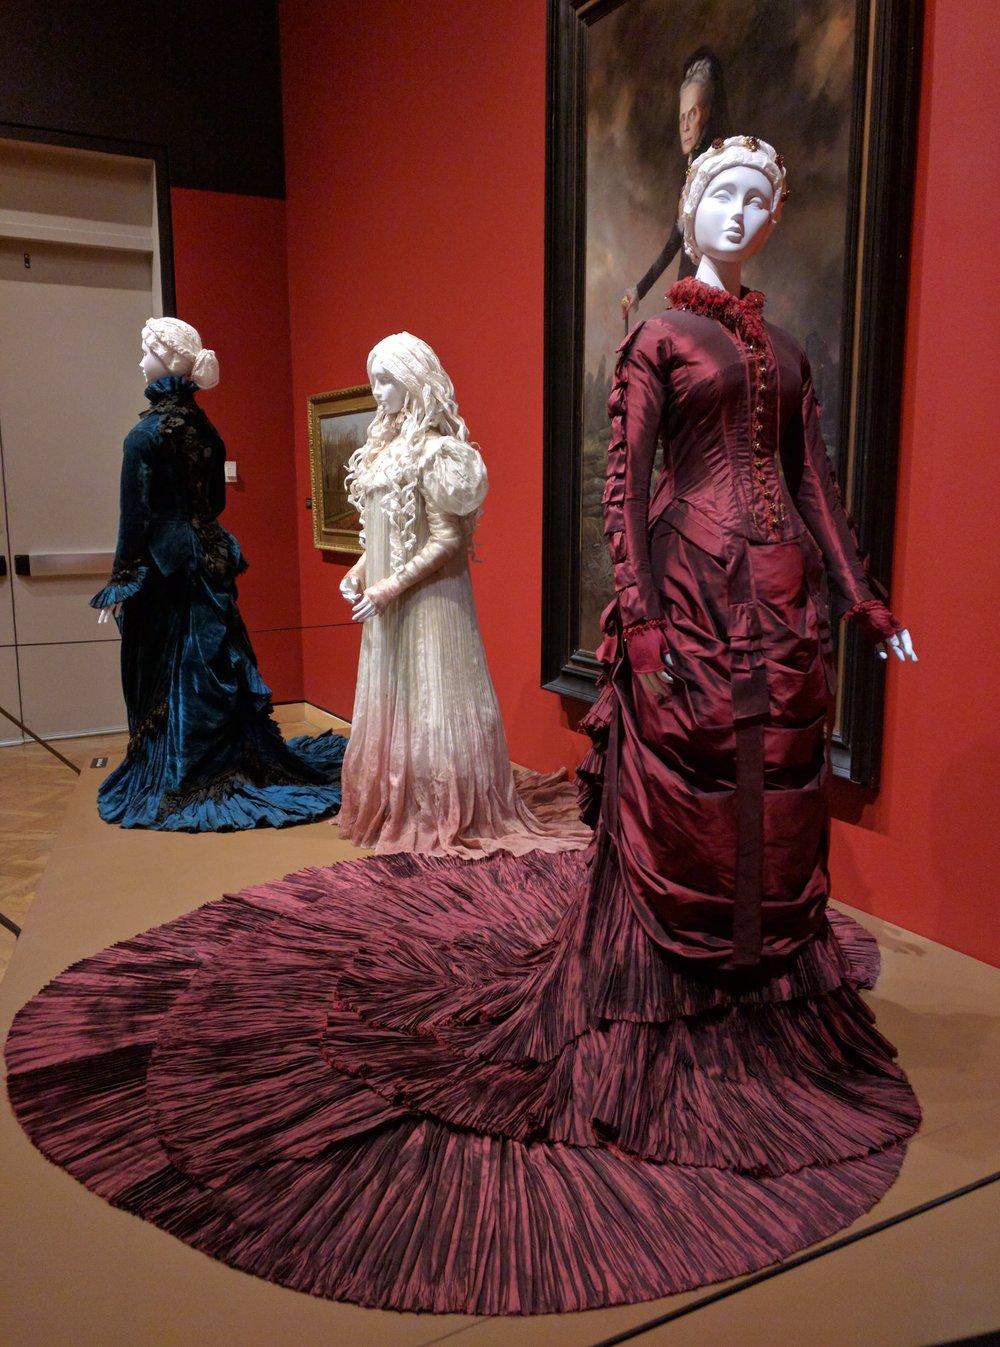 Costumes from Crimson Peak on display at Mia